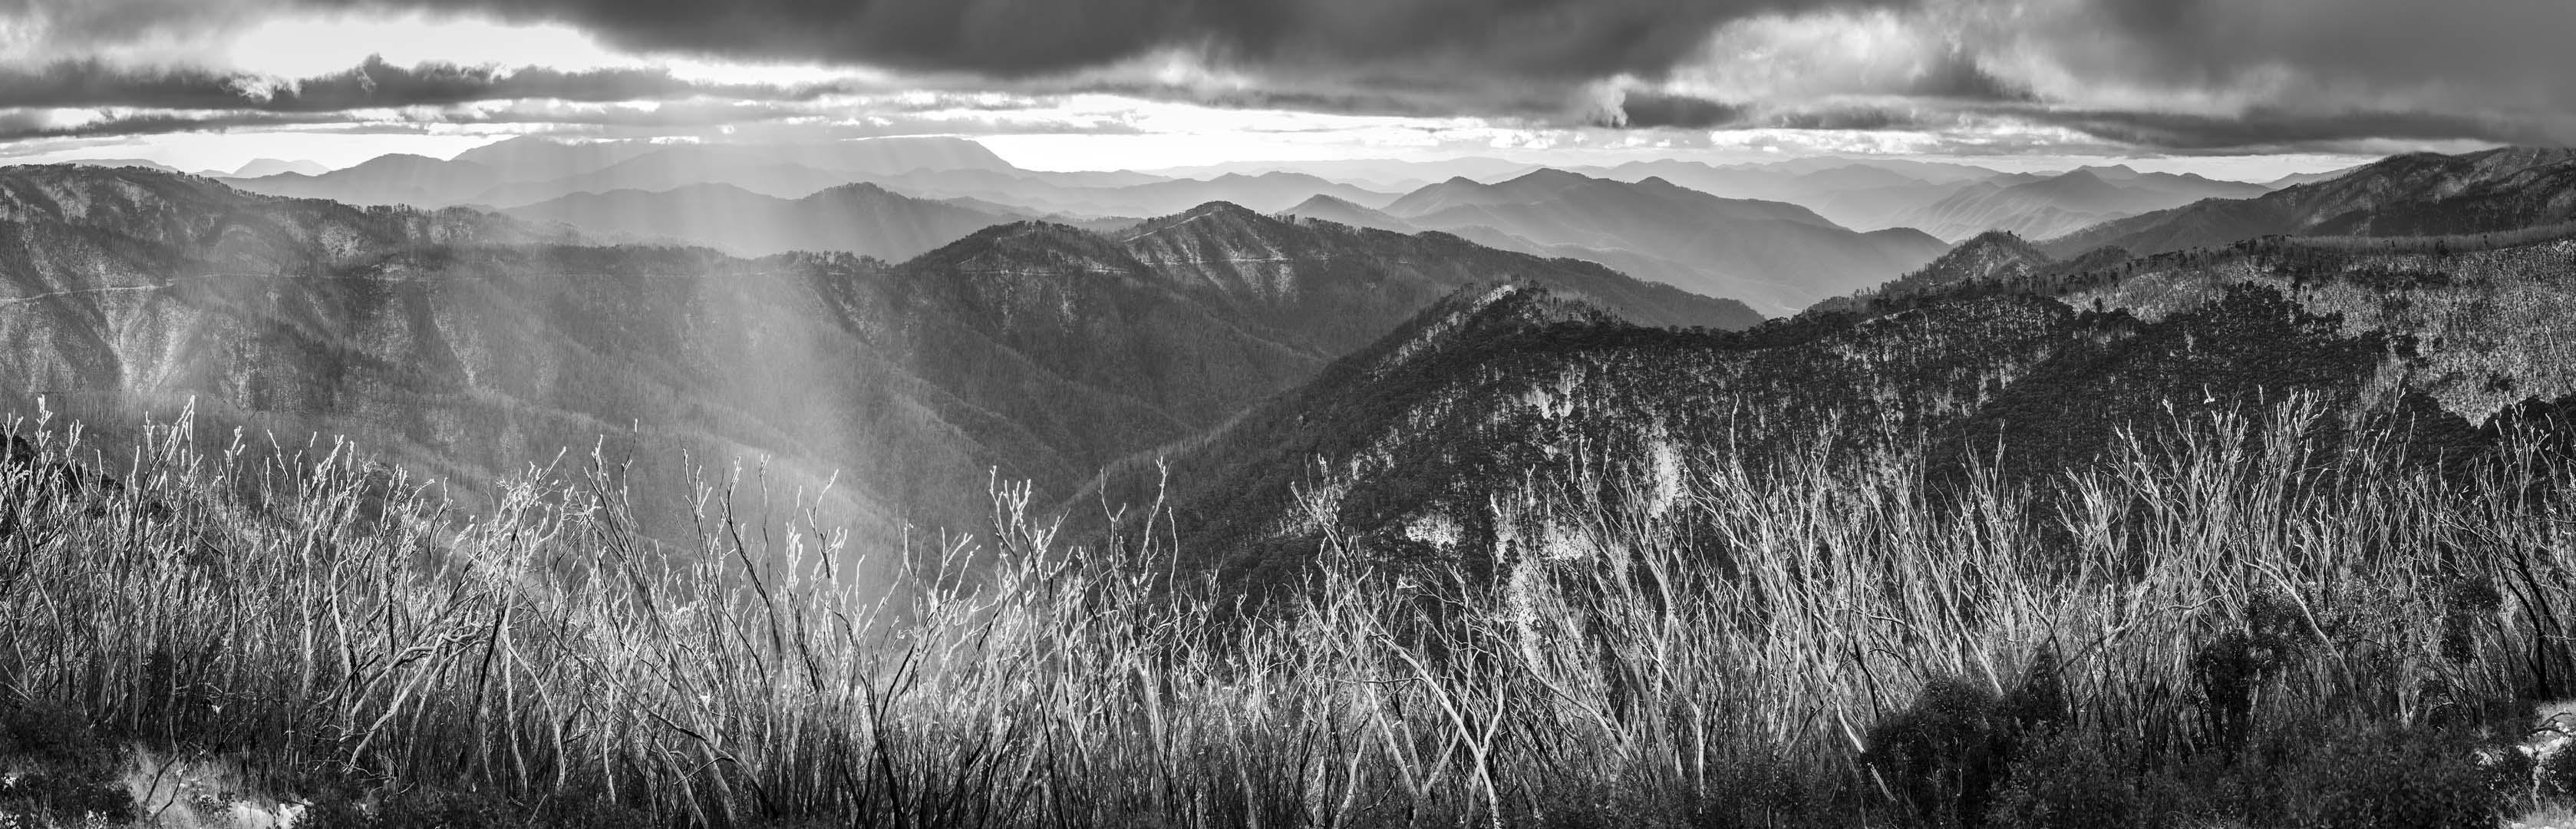 Victorian-Alps-Photography-Workshop